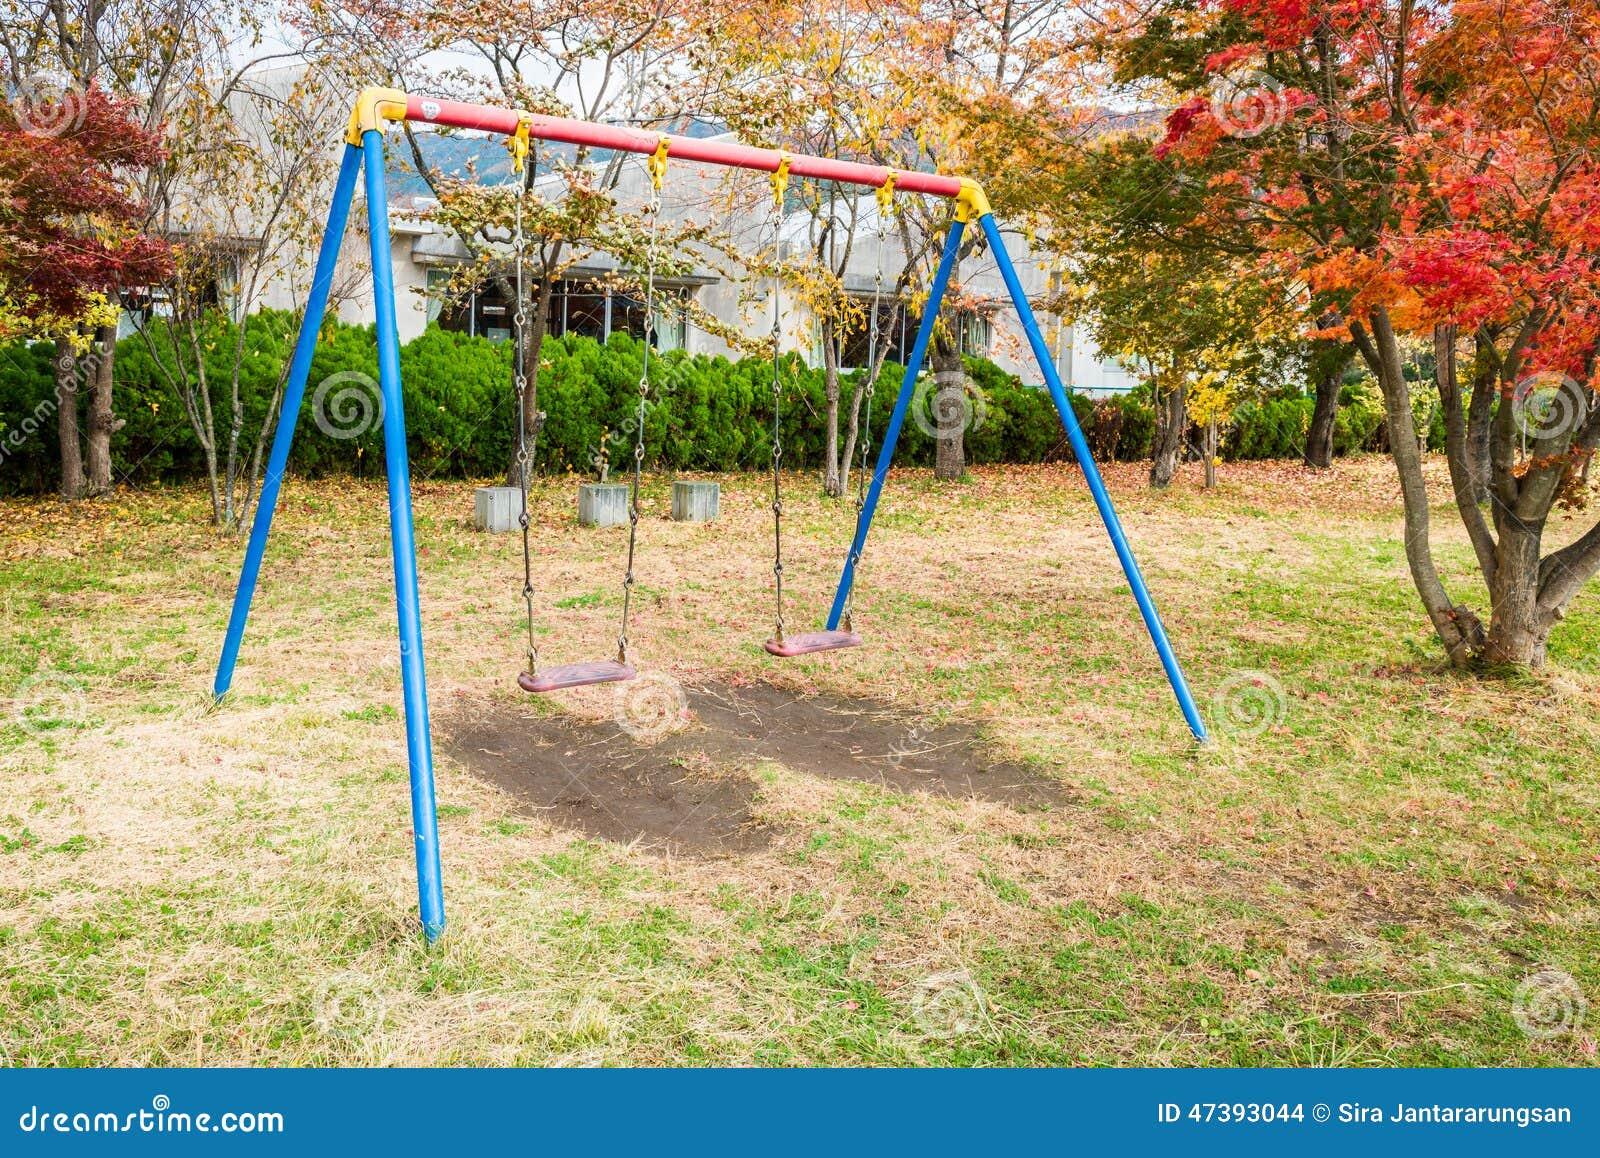 Swing for kid